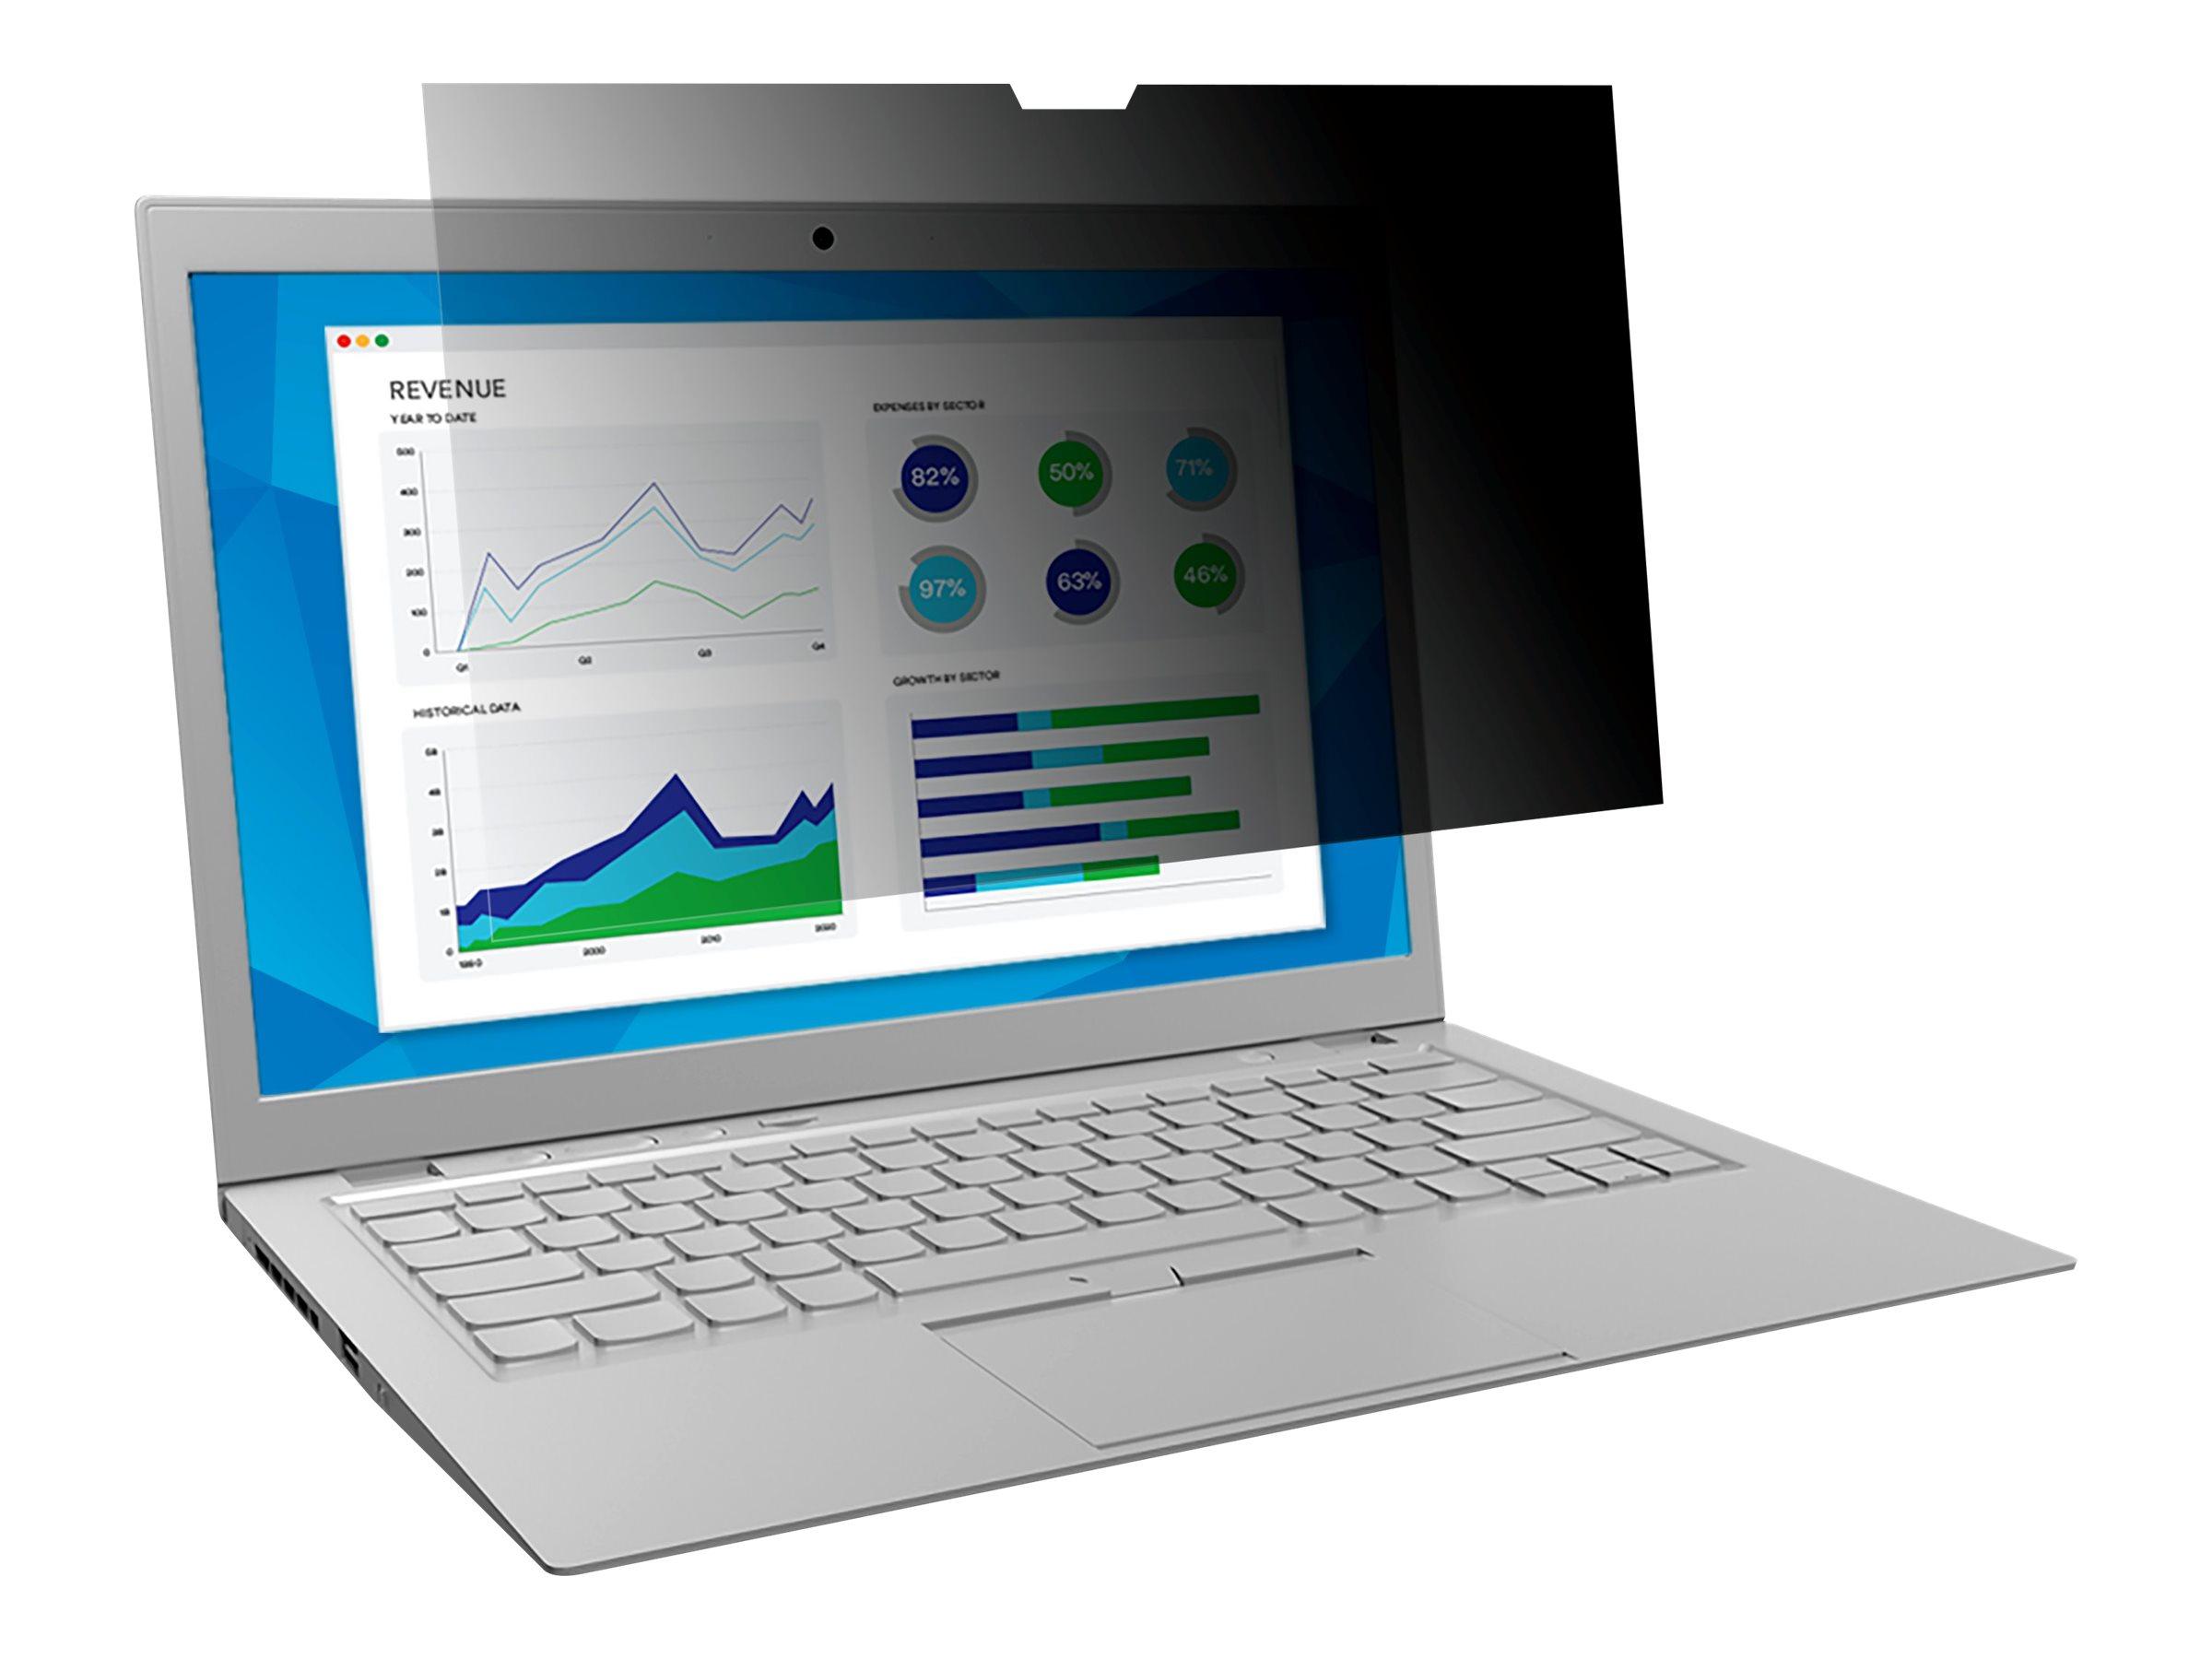 "3M Blickschutzfilter for 13.3"" Widescreen Laptop with COMPLY Attachment System - Blickschutzfilter für Notebook - 33,8 cm Breitbild (13,3 Zoll Breitbild)"